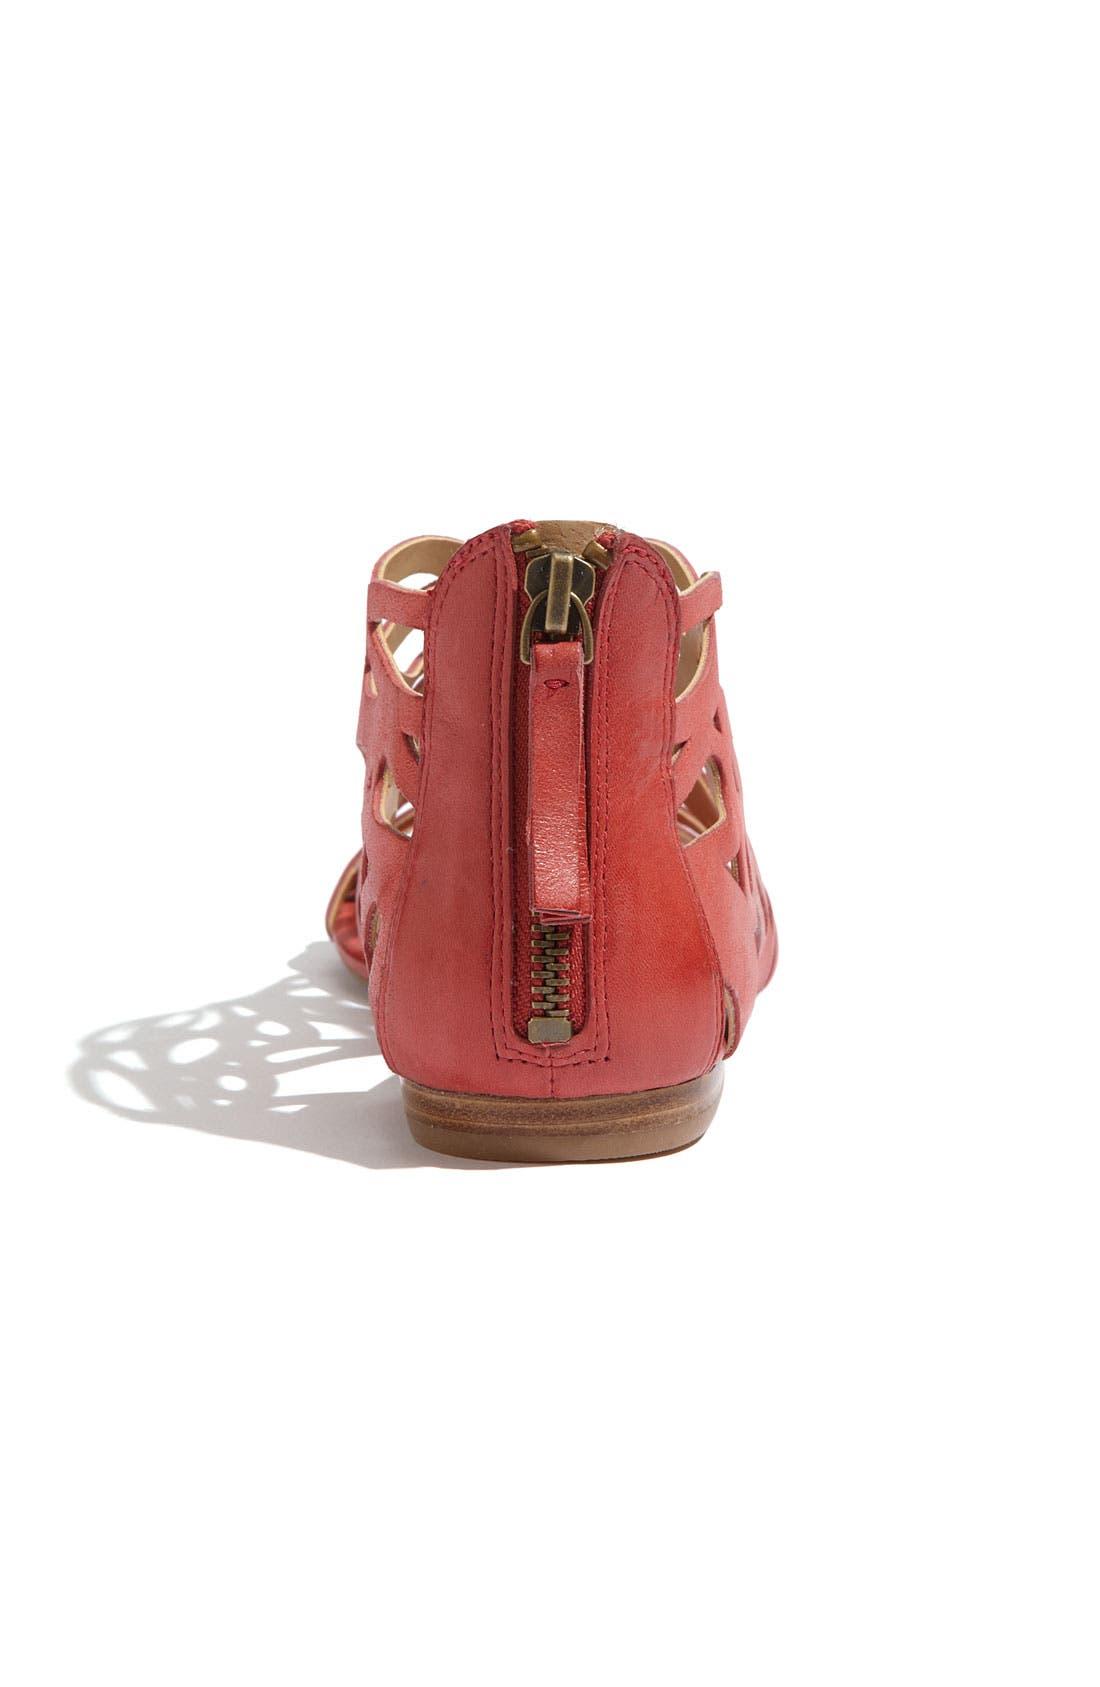 'Tali' Sandal,                             Alternate thumbnail 4, color,                             Red Leather